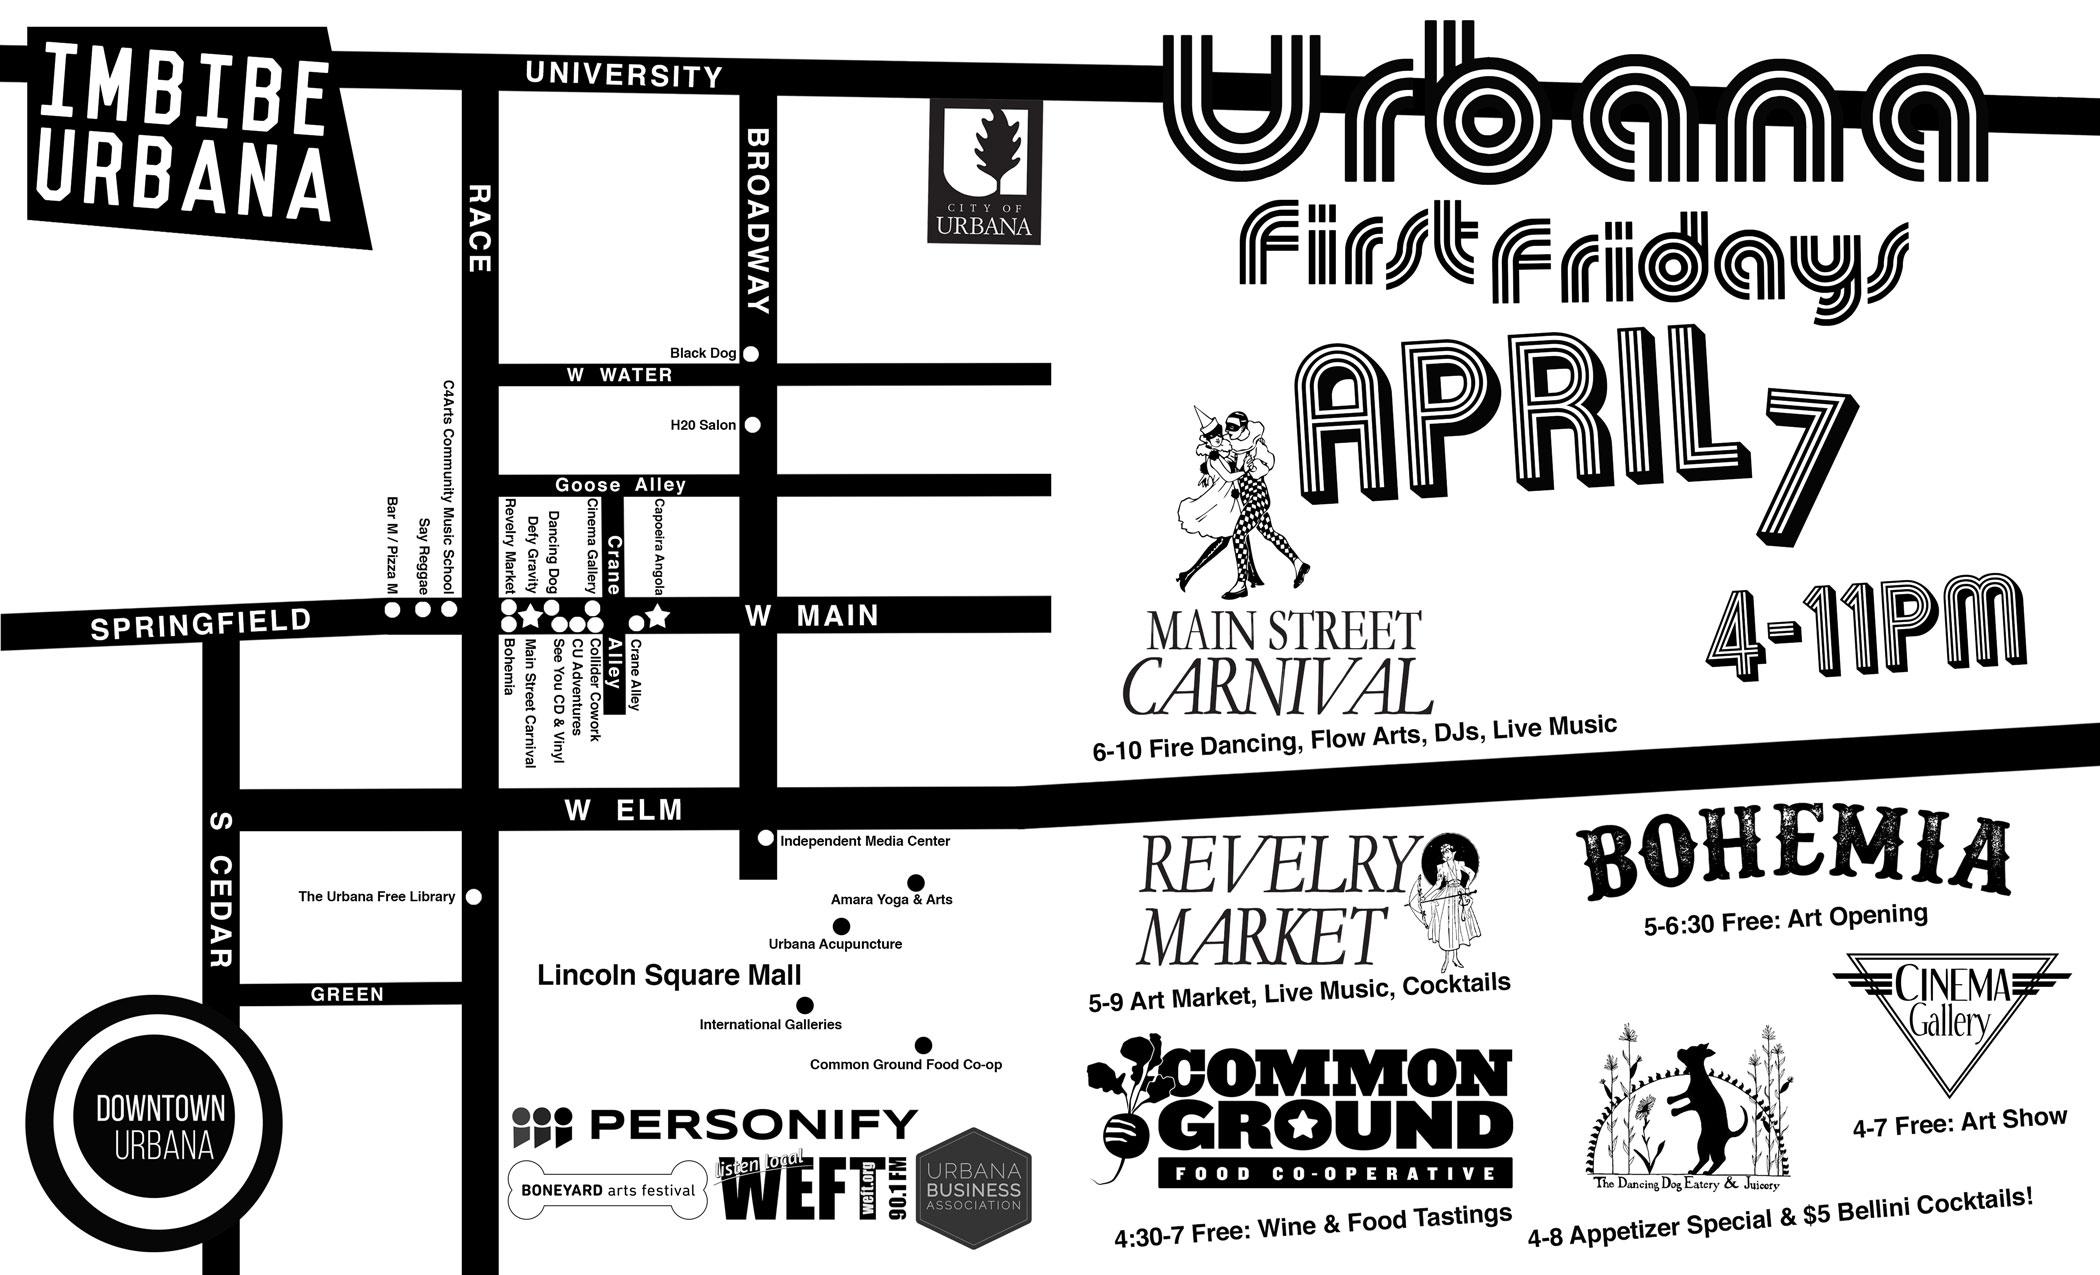 URBANA FIRST FRIDAYS April 7 4-11PM